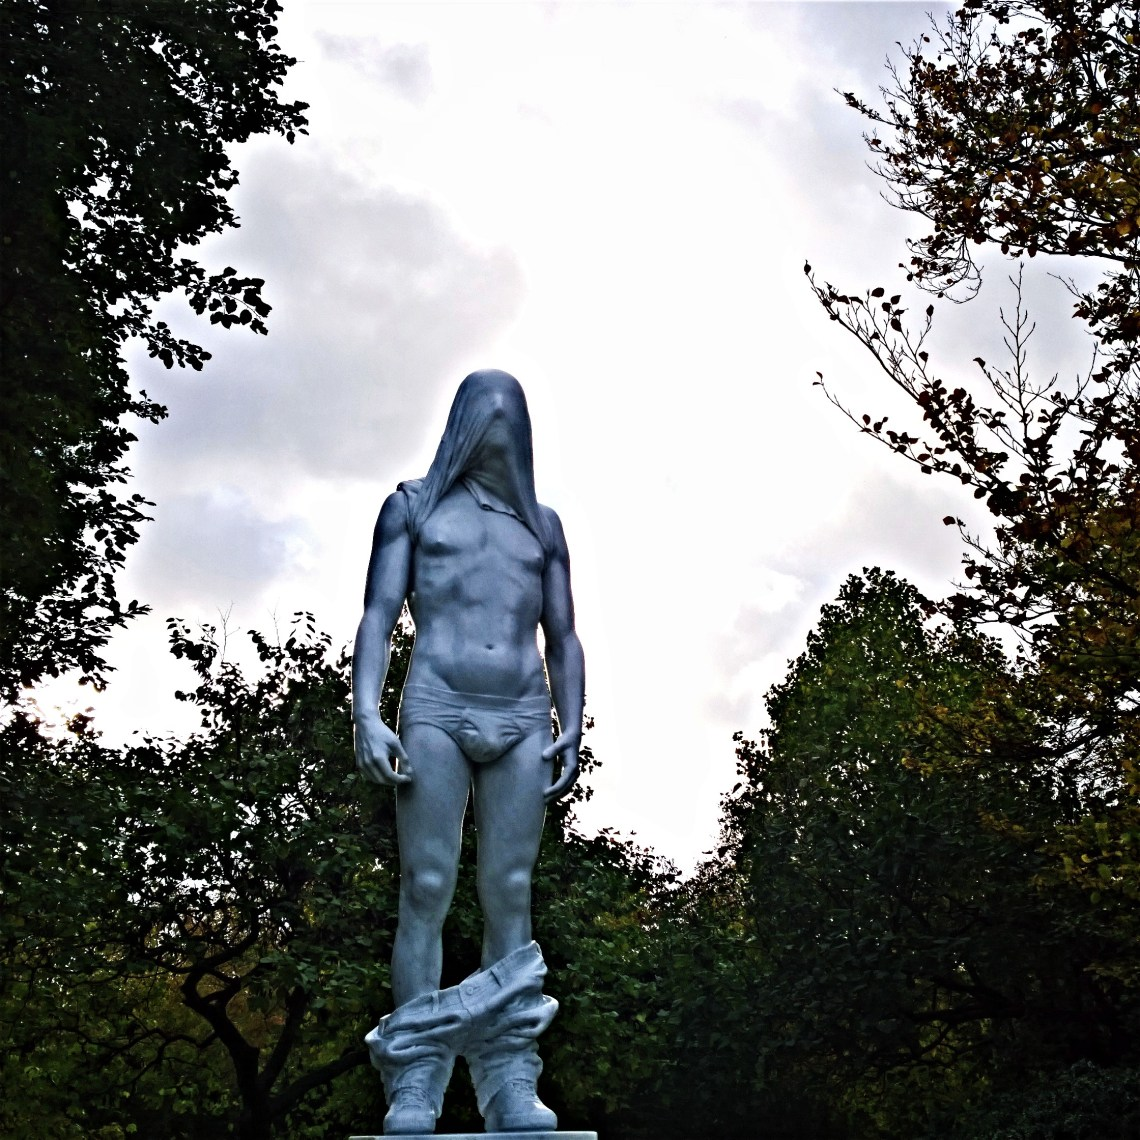 Naked Man (2013) by Reza Aramesh from Leila Heller Gallery